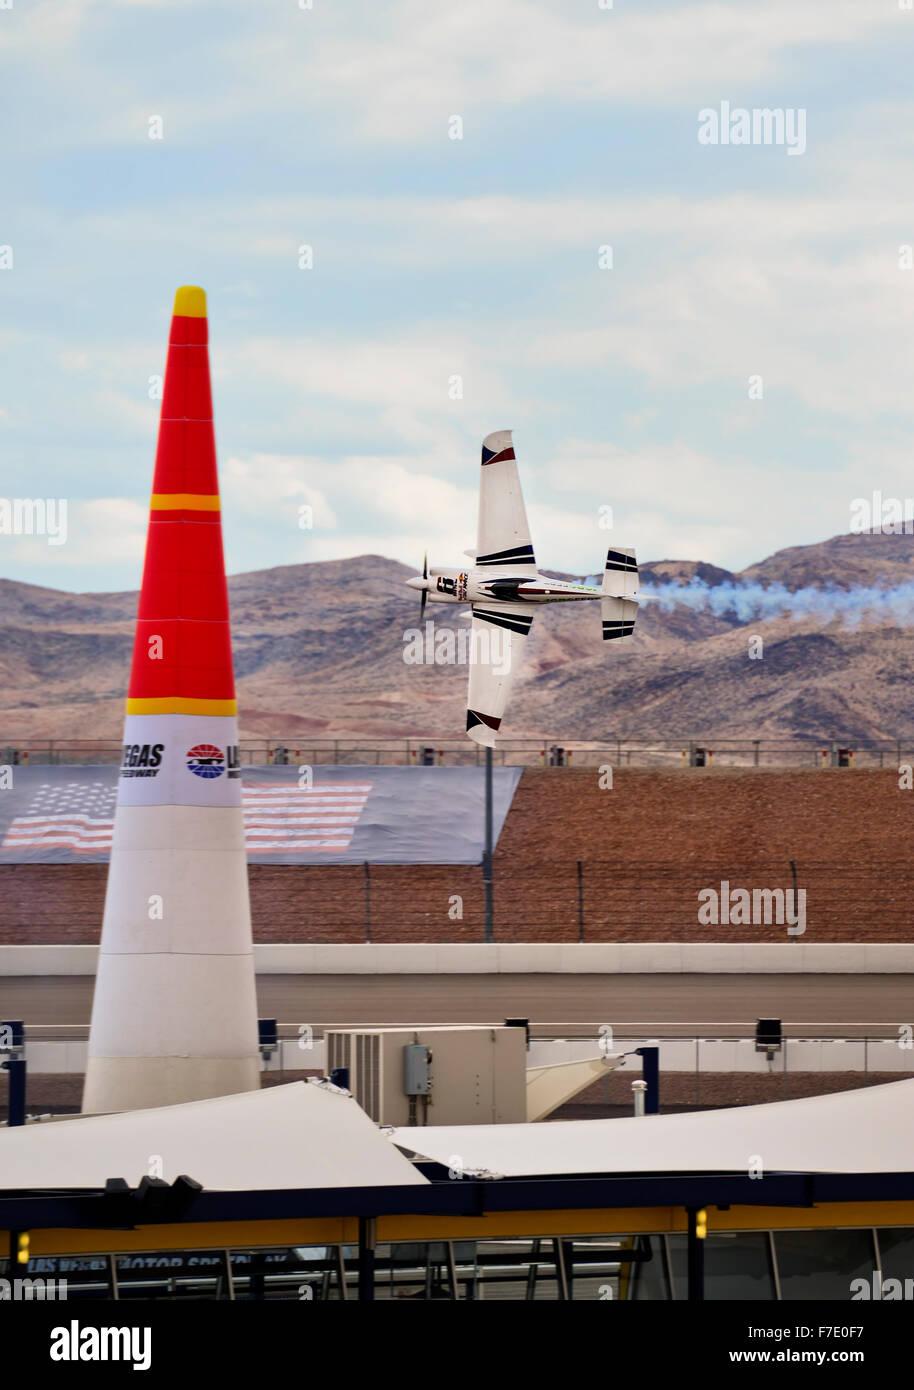 Red Bull Air Races in Las Vegas, Nevada - Stock Image